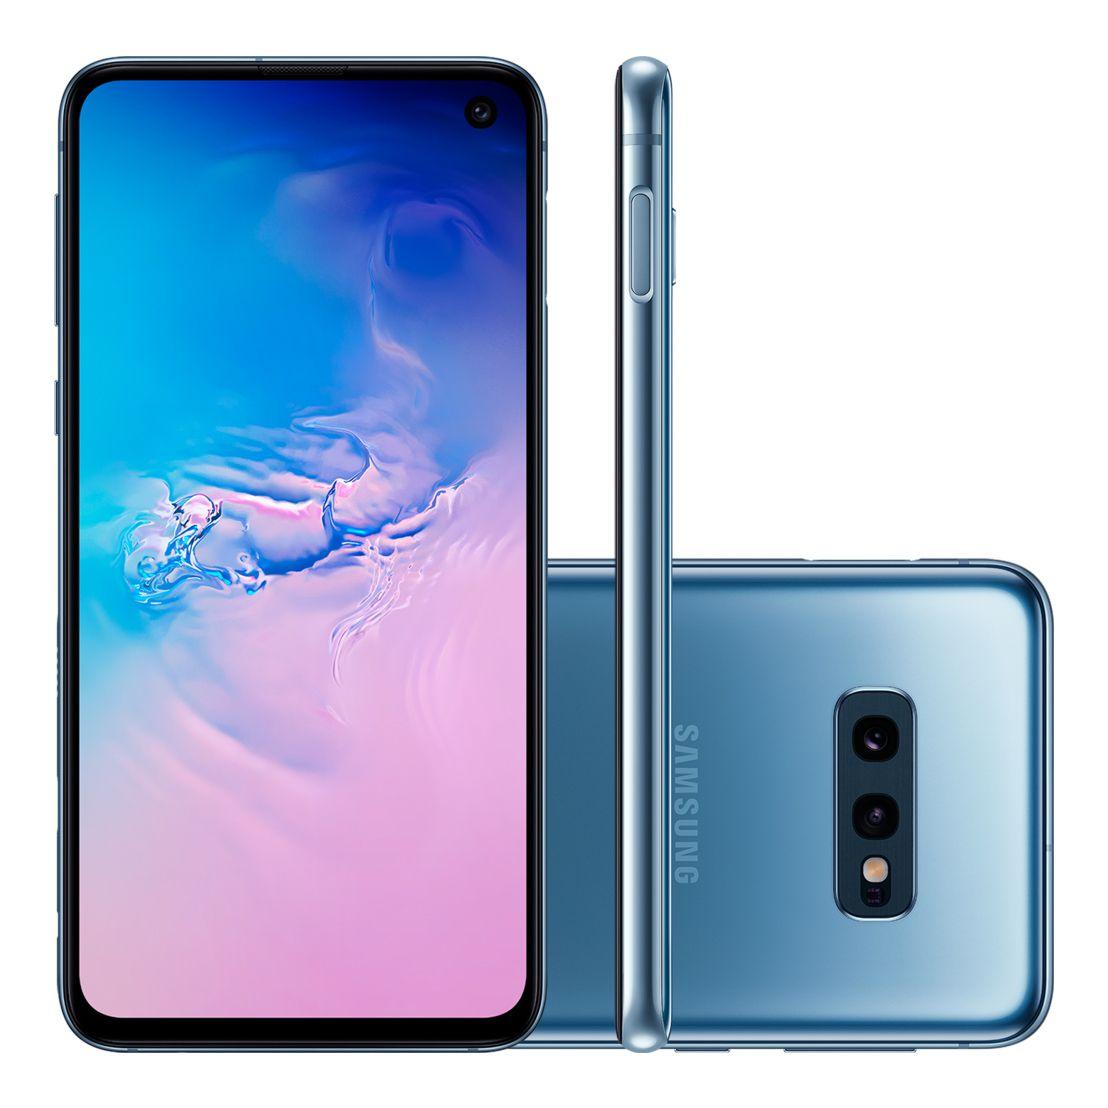 Smartphone Samsung Galaxy s10e 6GB RAM + 128GB Azul